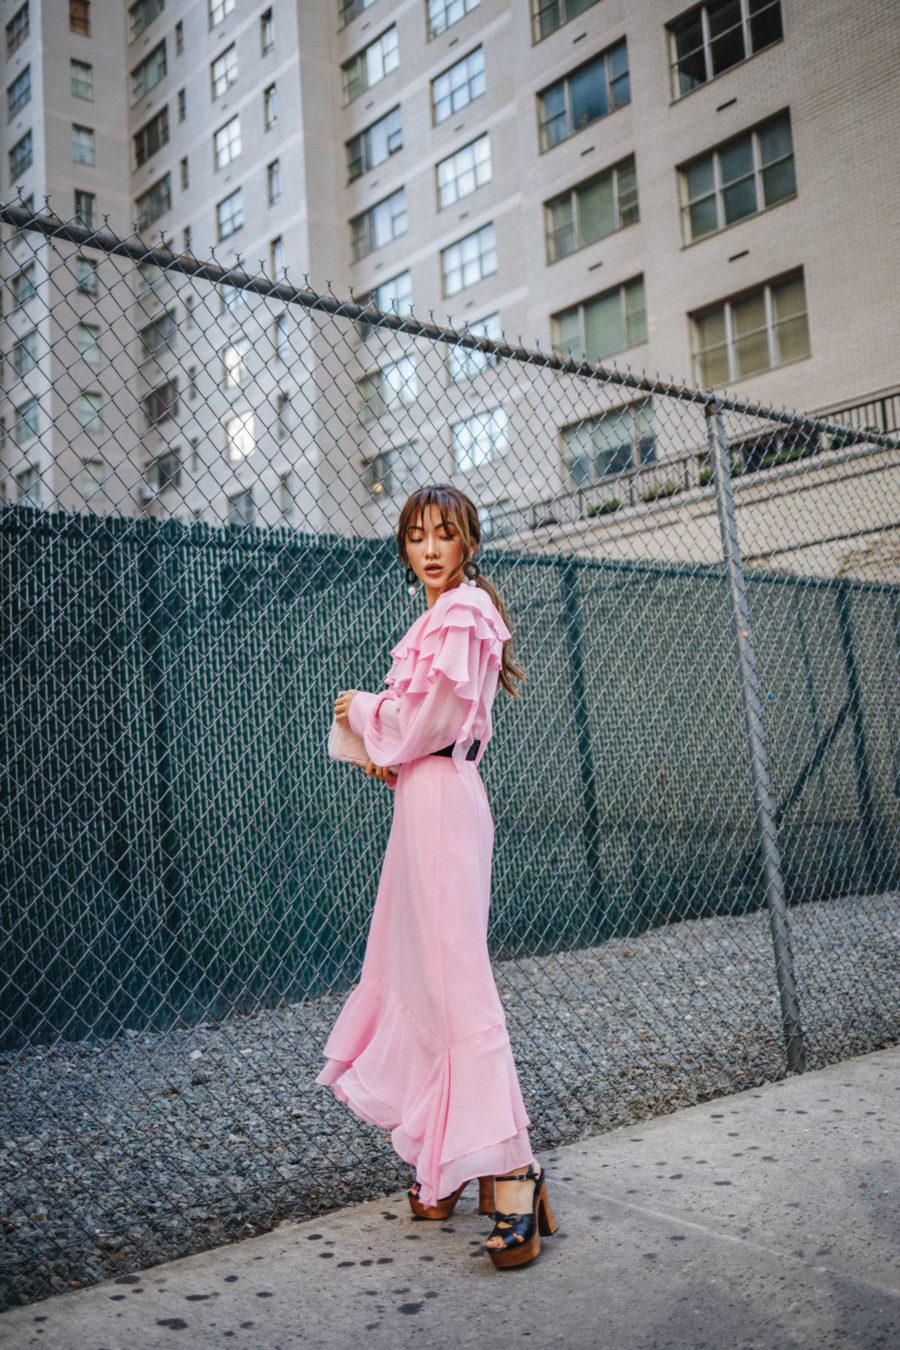 NYFW Day 2 Pink Ruffle Dress Street Style // NotJessFashion.com